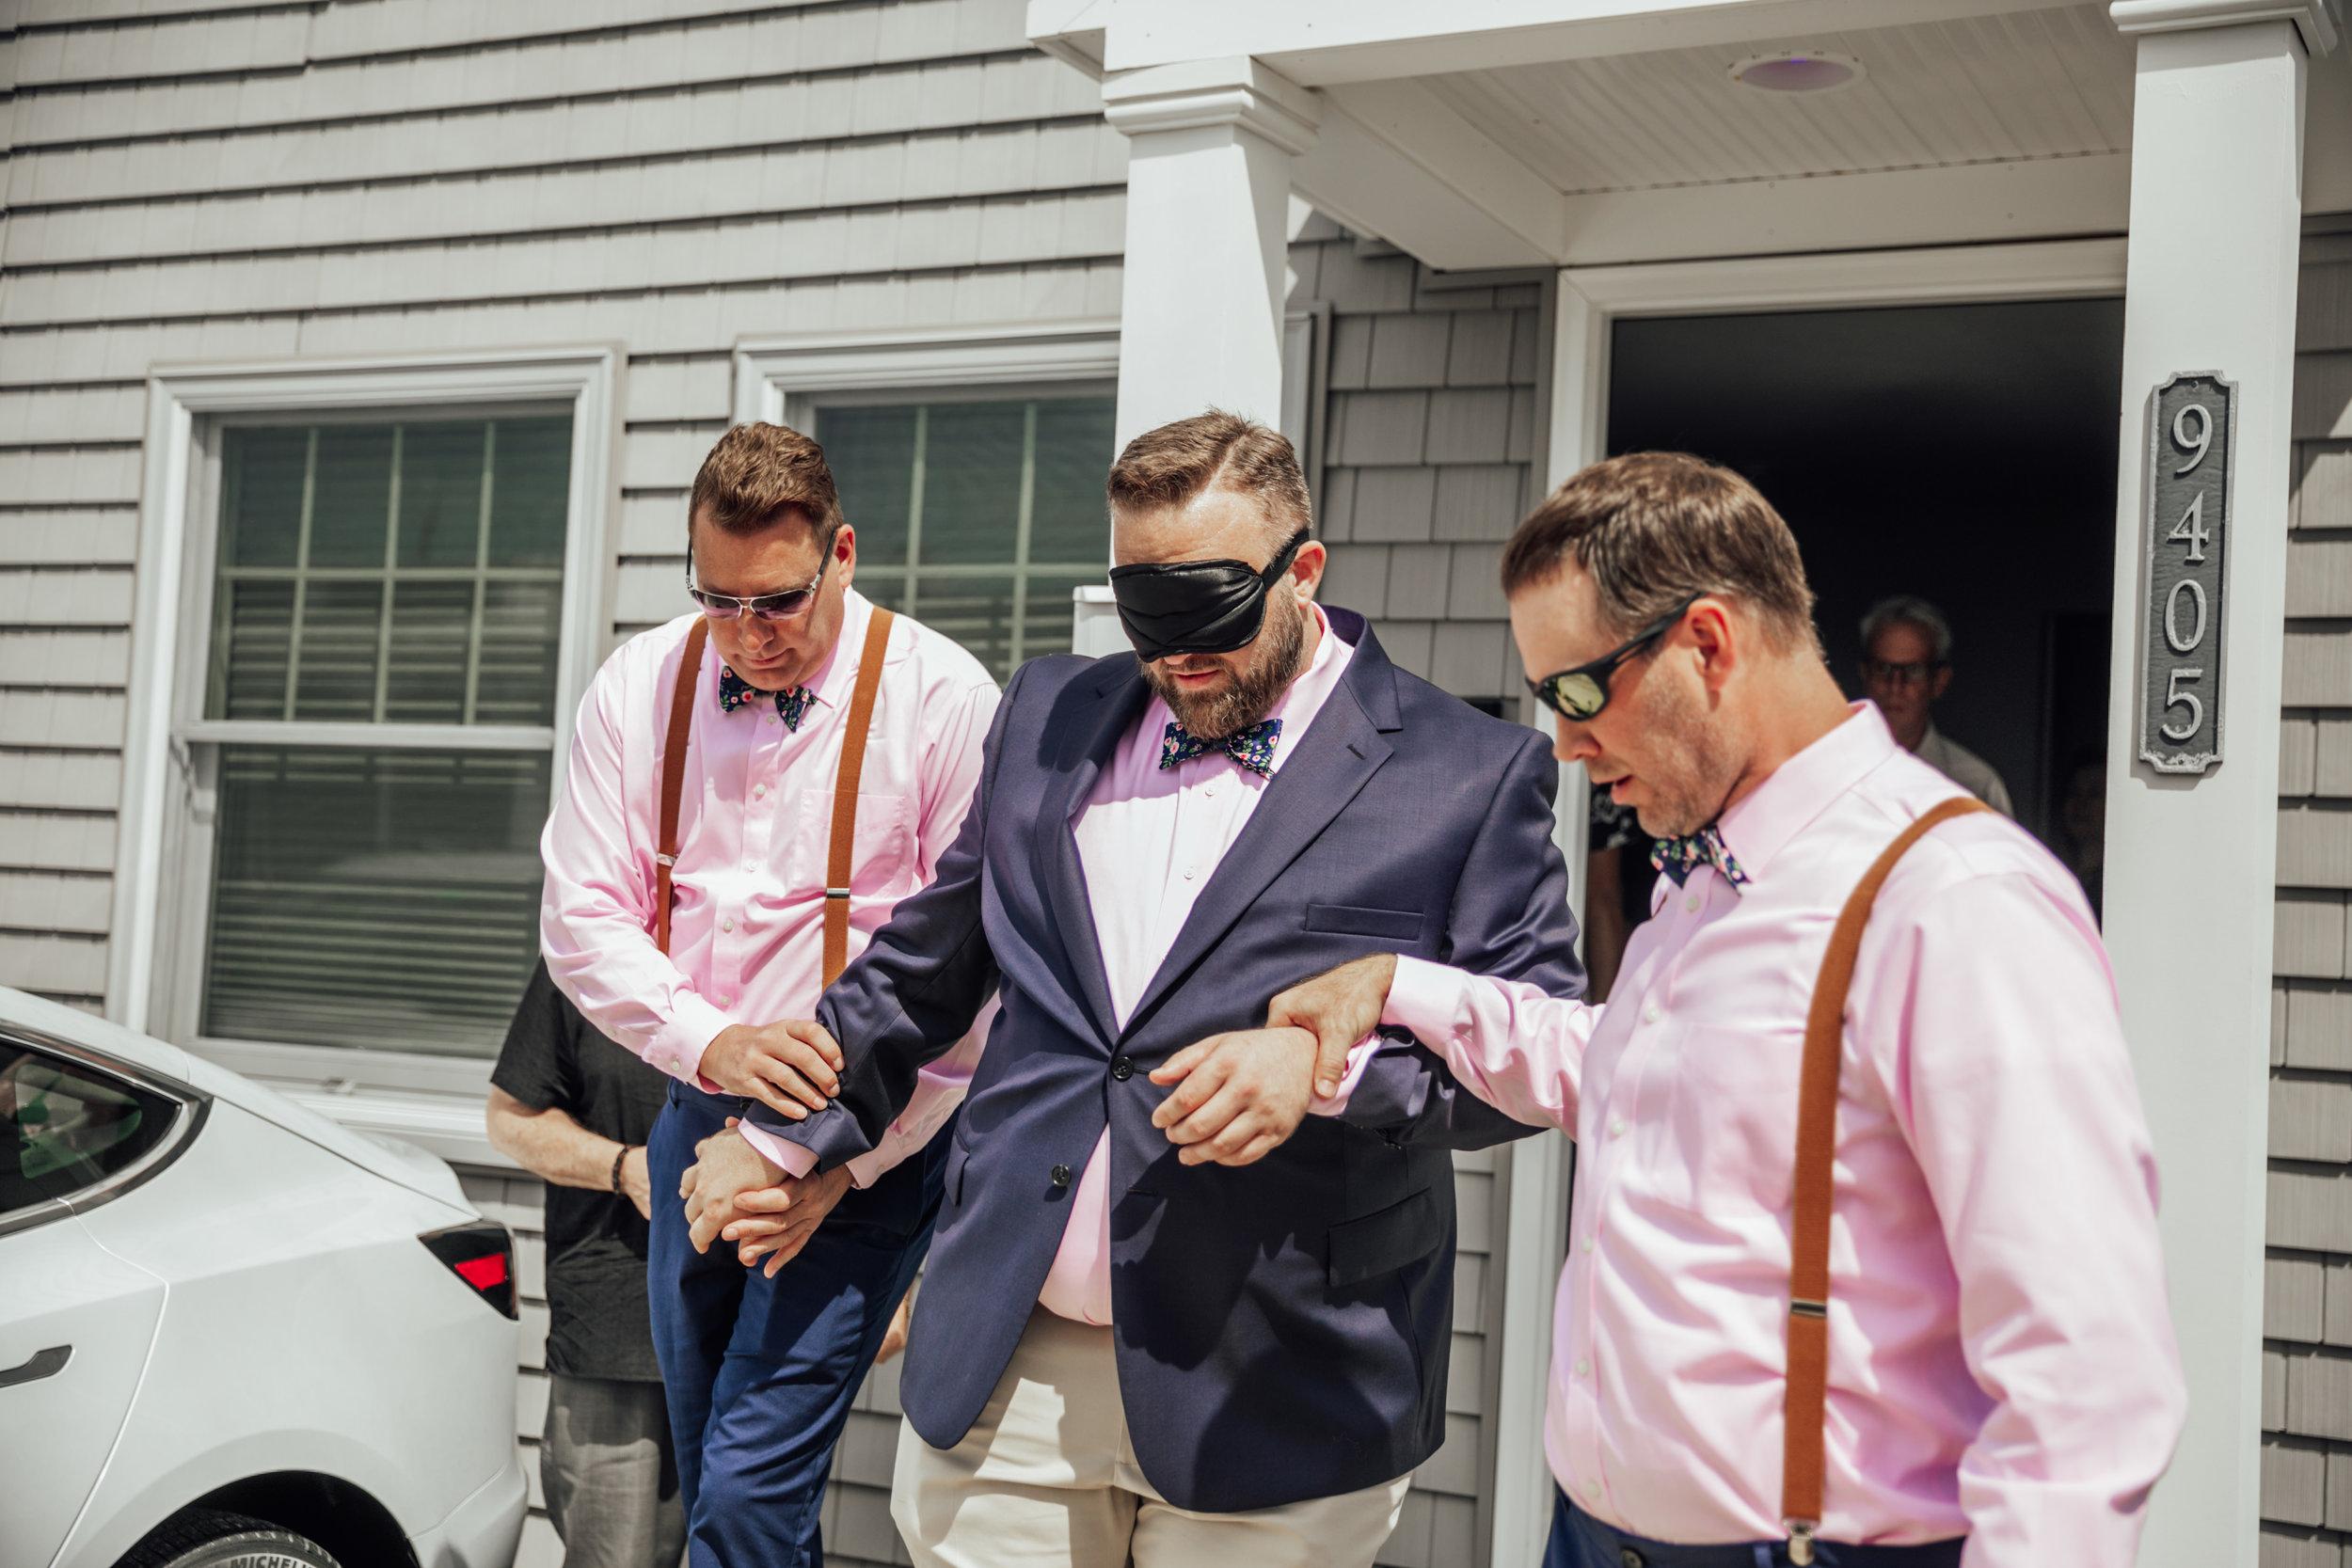 New Jersey Wedding Photographer, Felsberg Photography LBI wedding photography 58.jpg